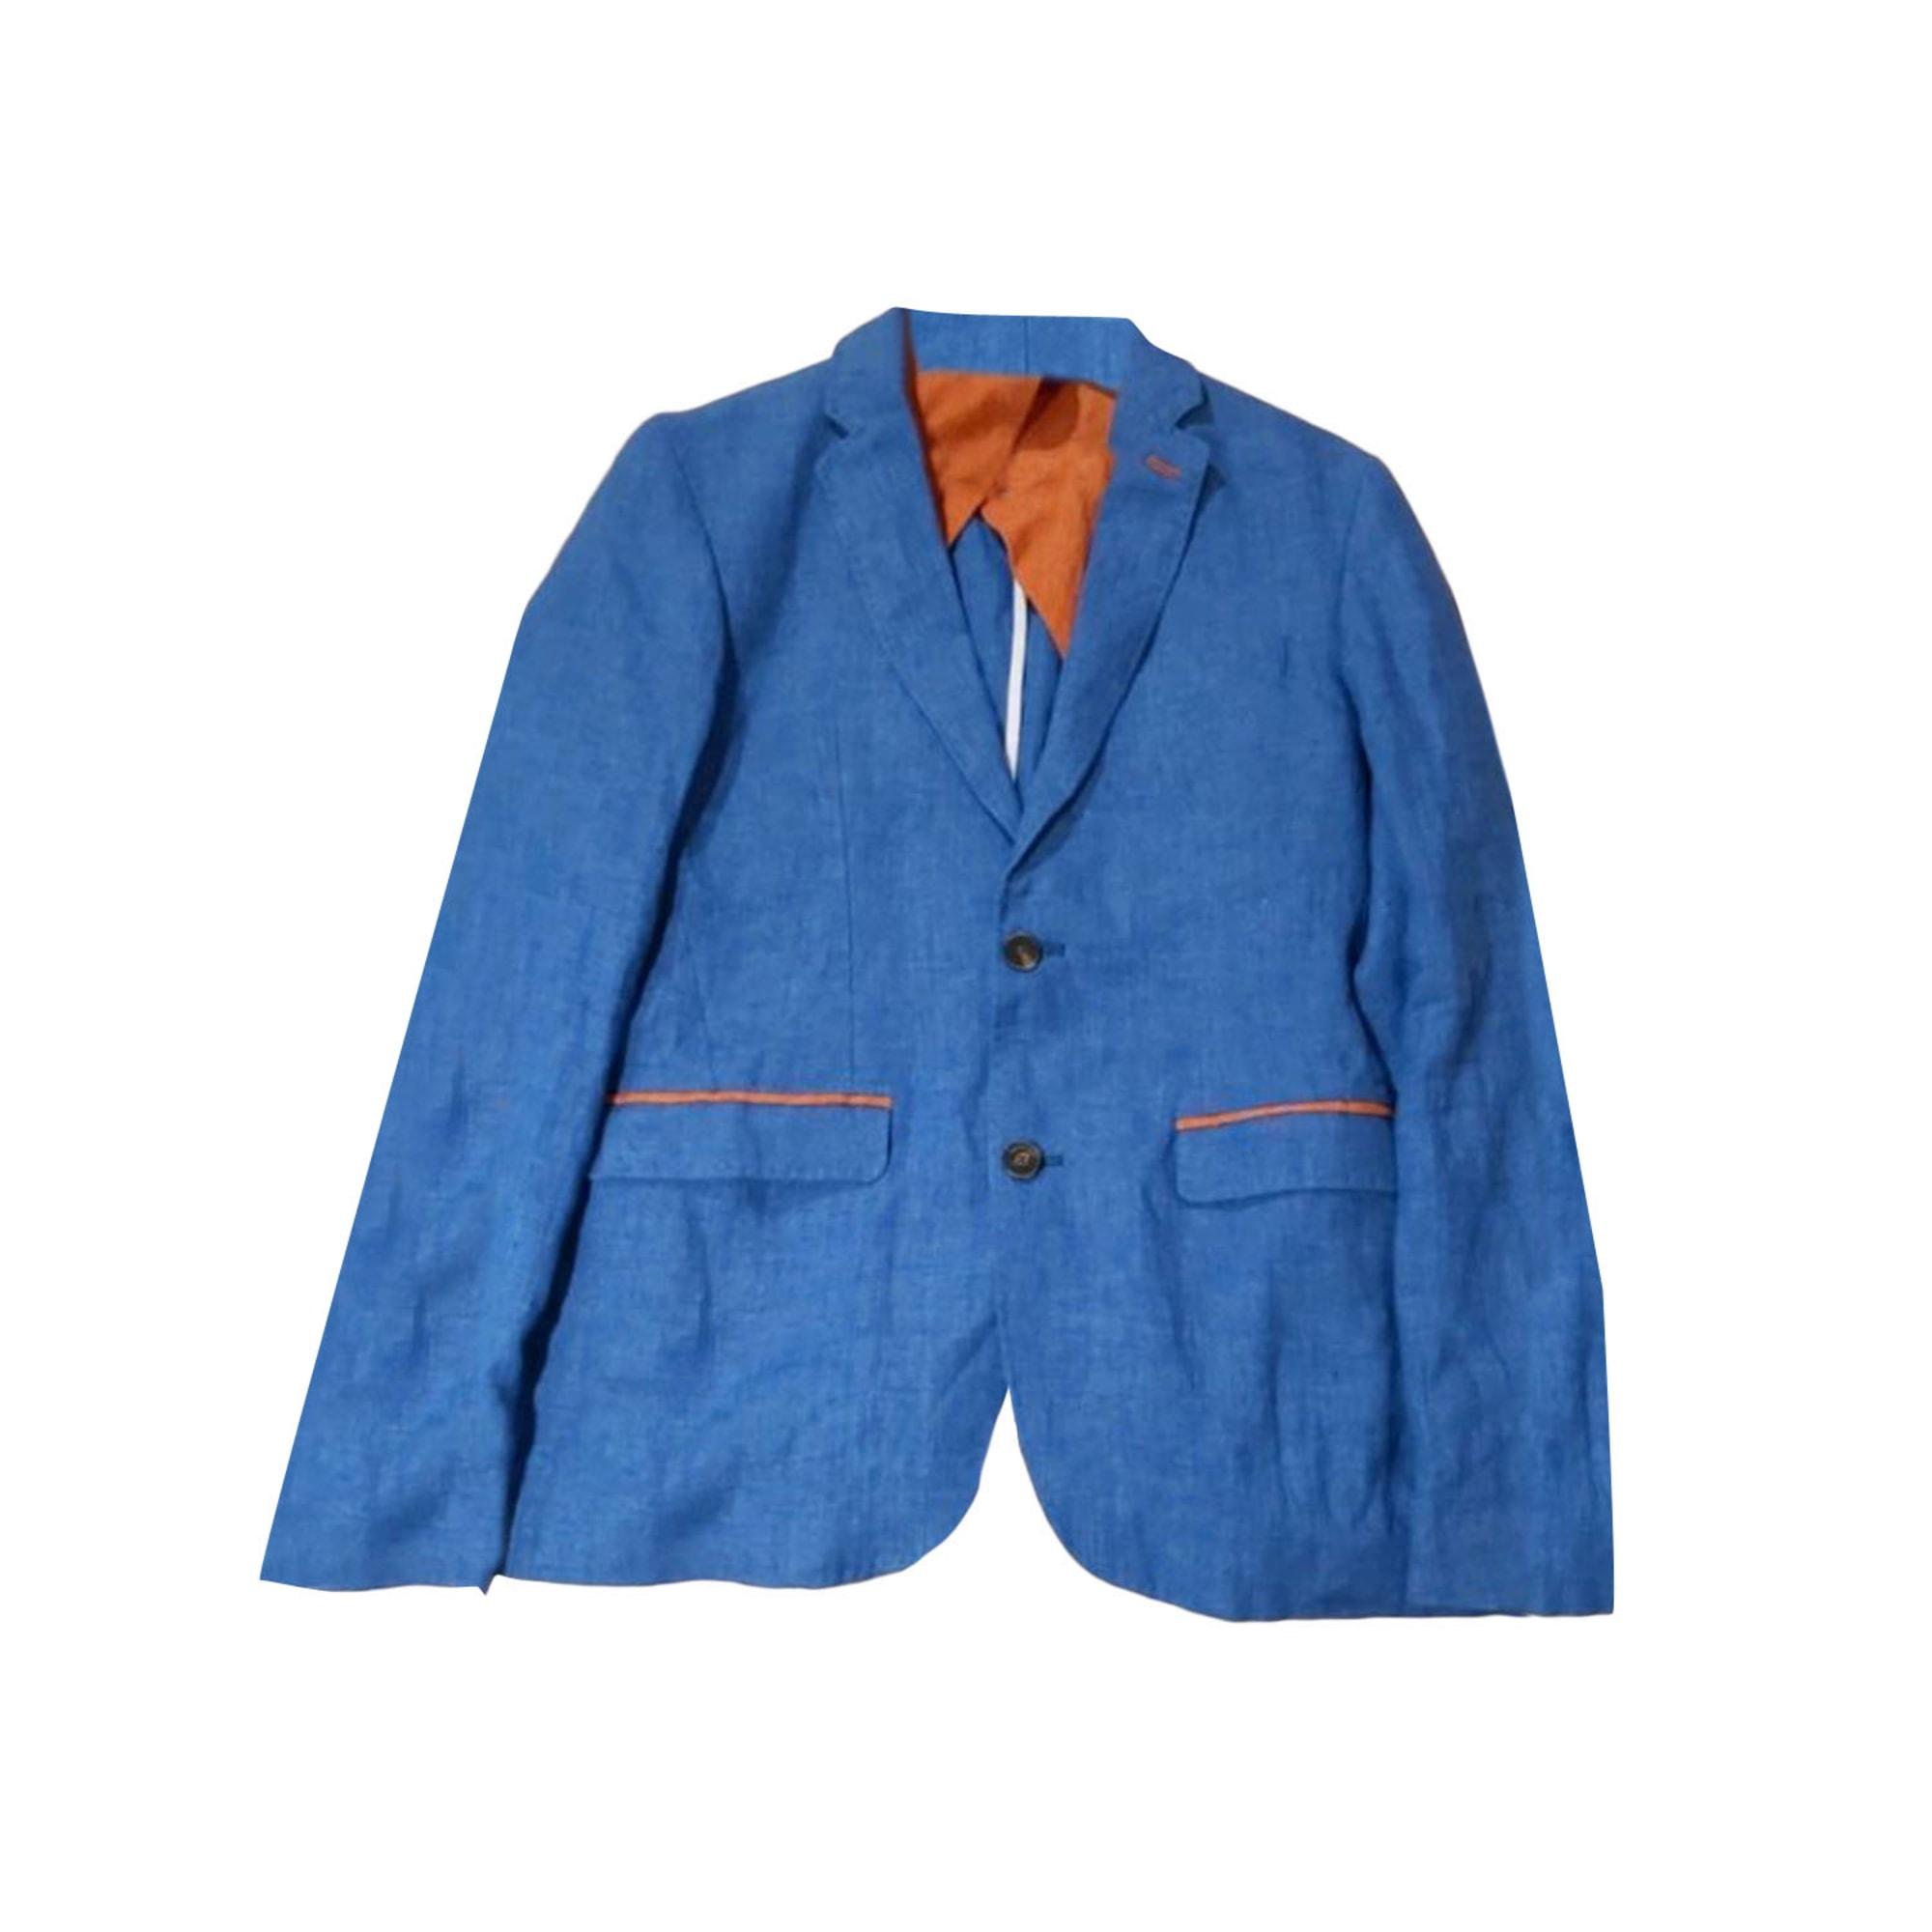 Veste SERGE BLANCO Bleu, bleu marine, bleu turquoise